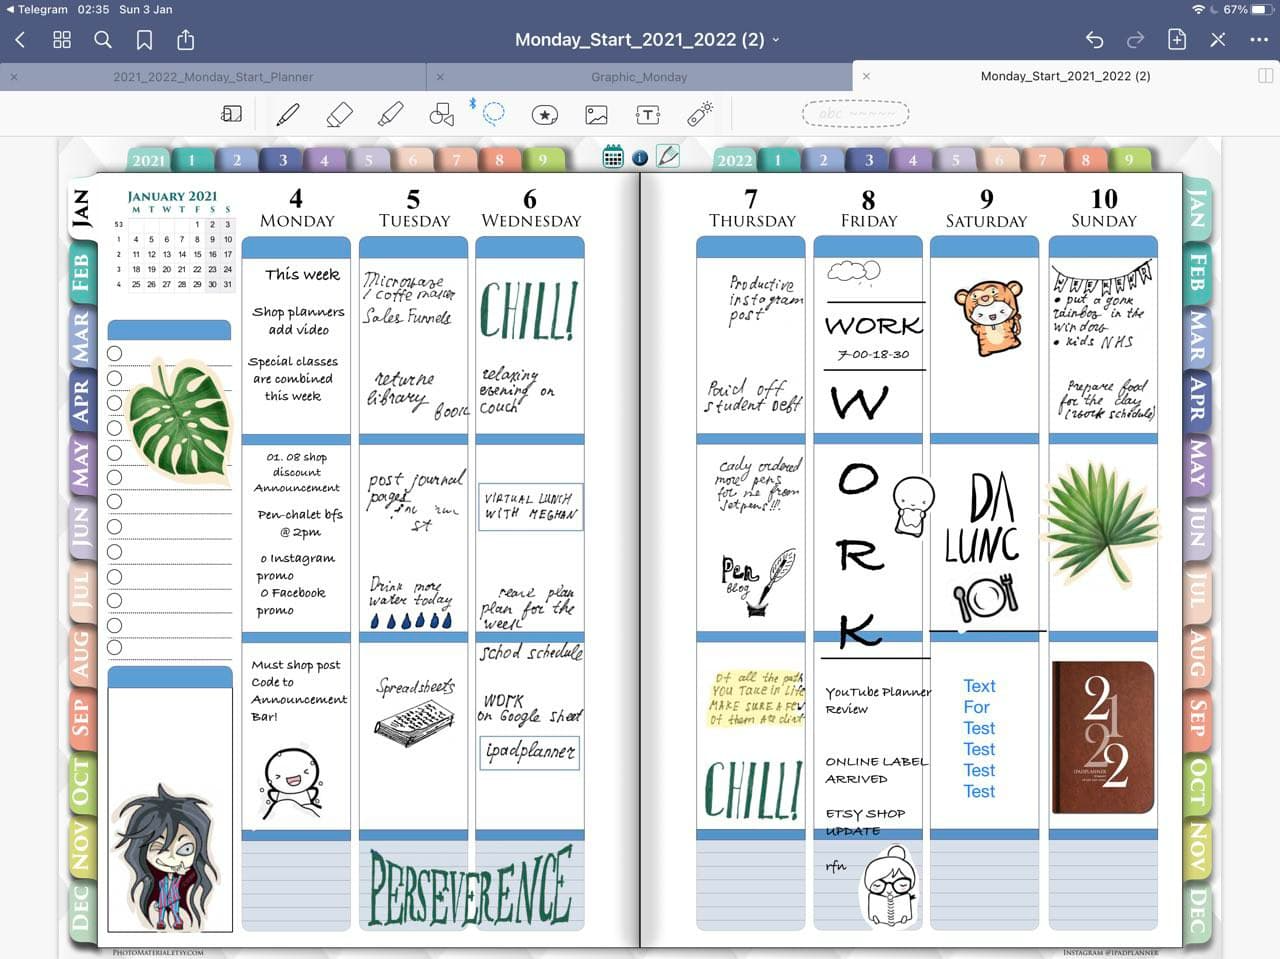 2021 2022 digital weekly planner for goodnotes ipadplanner.com